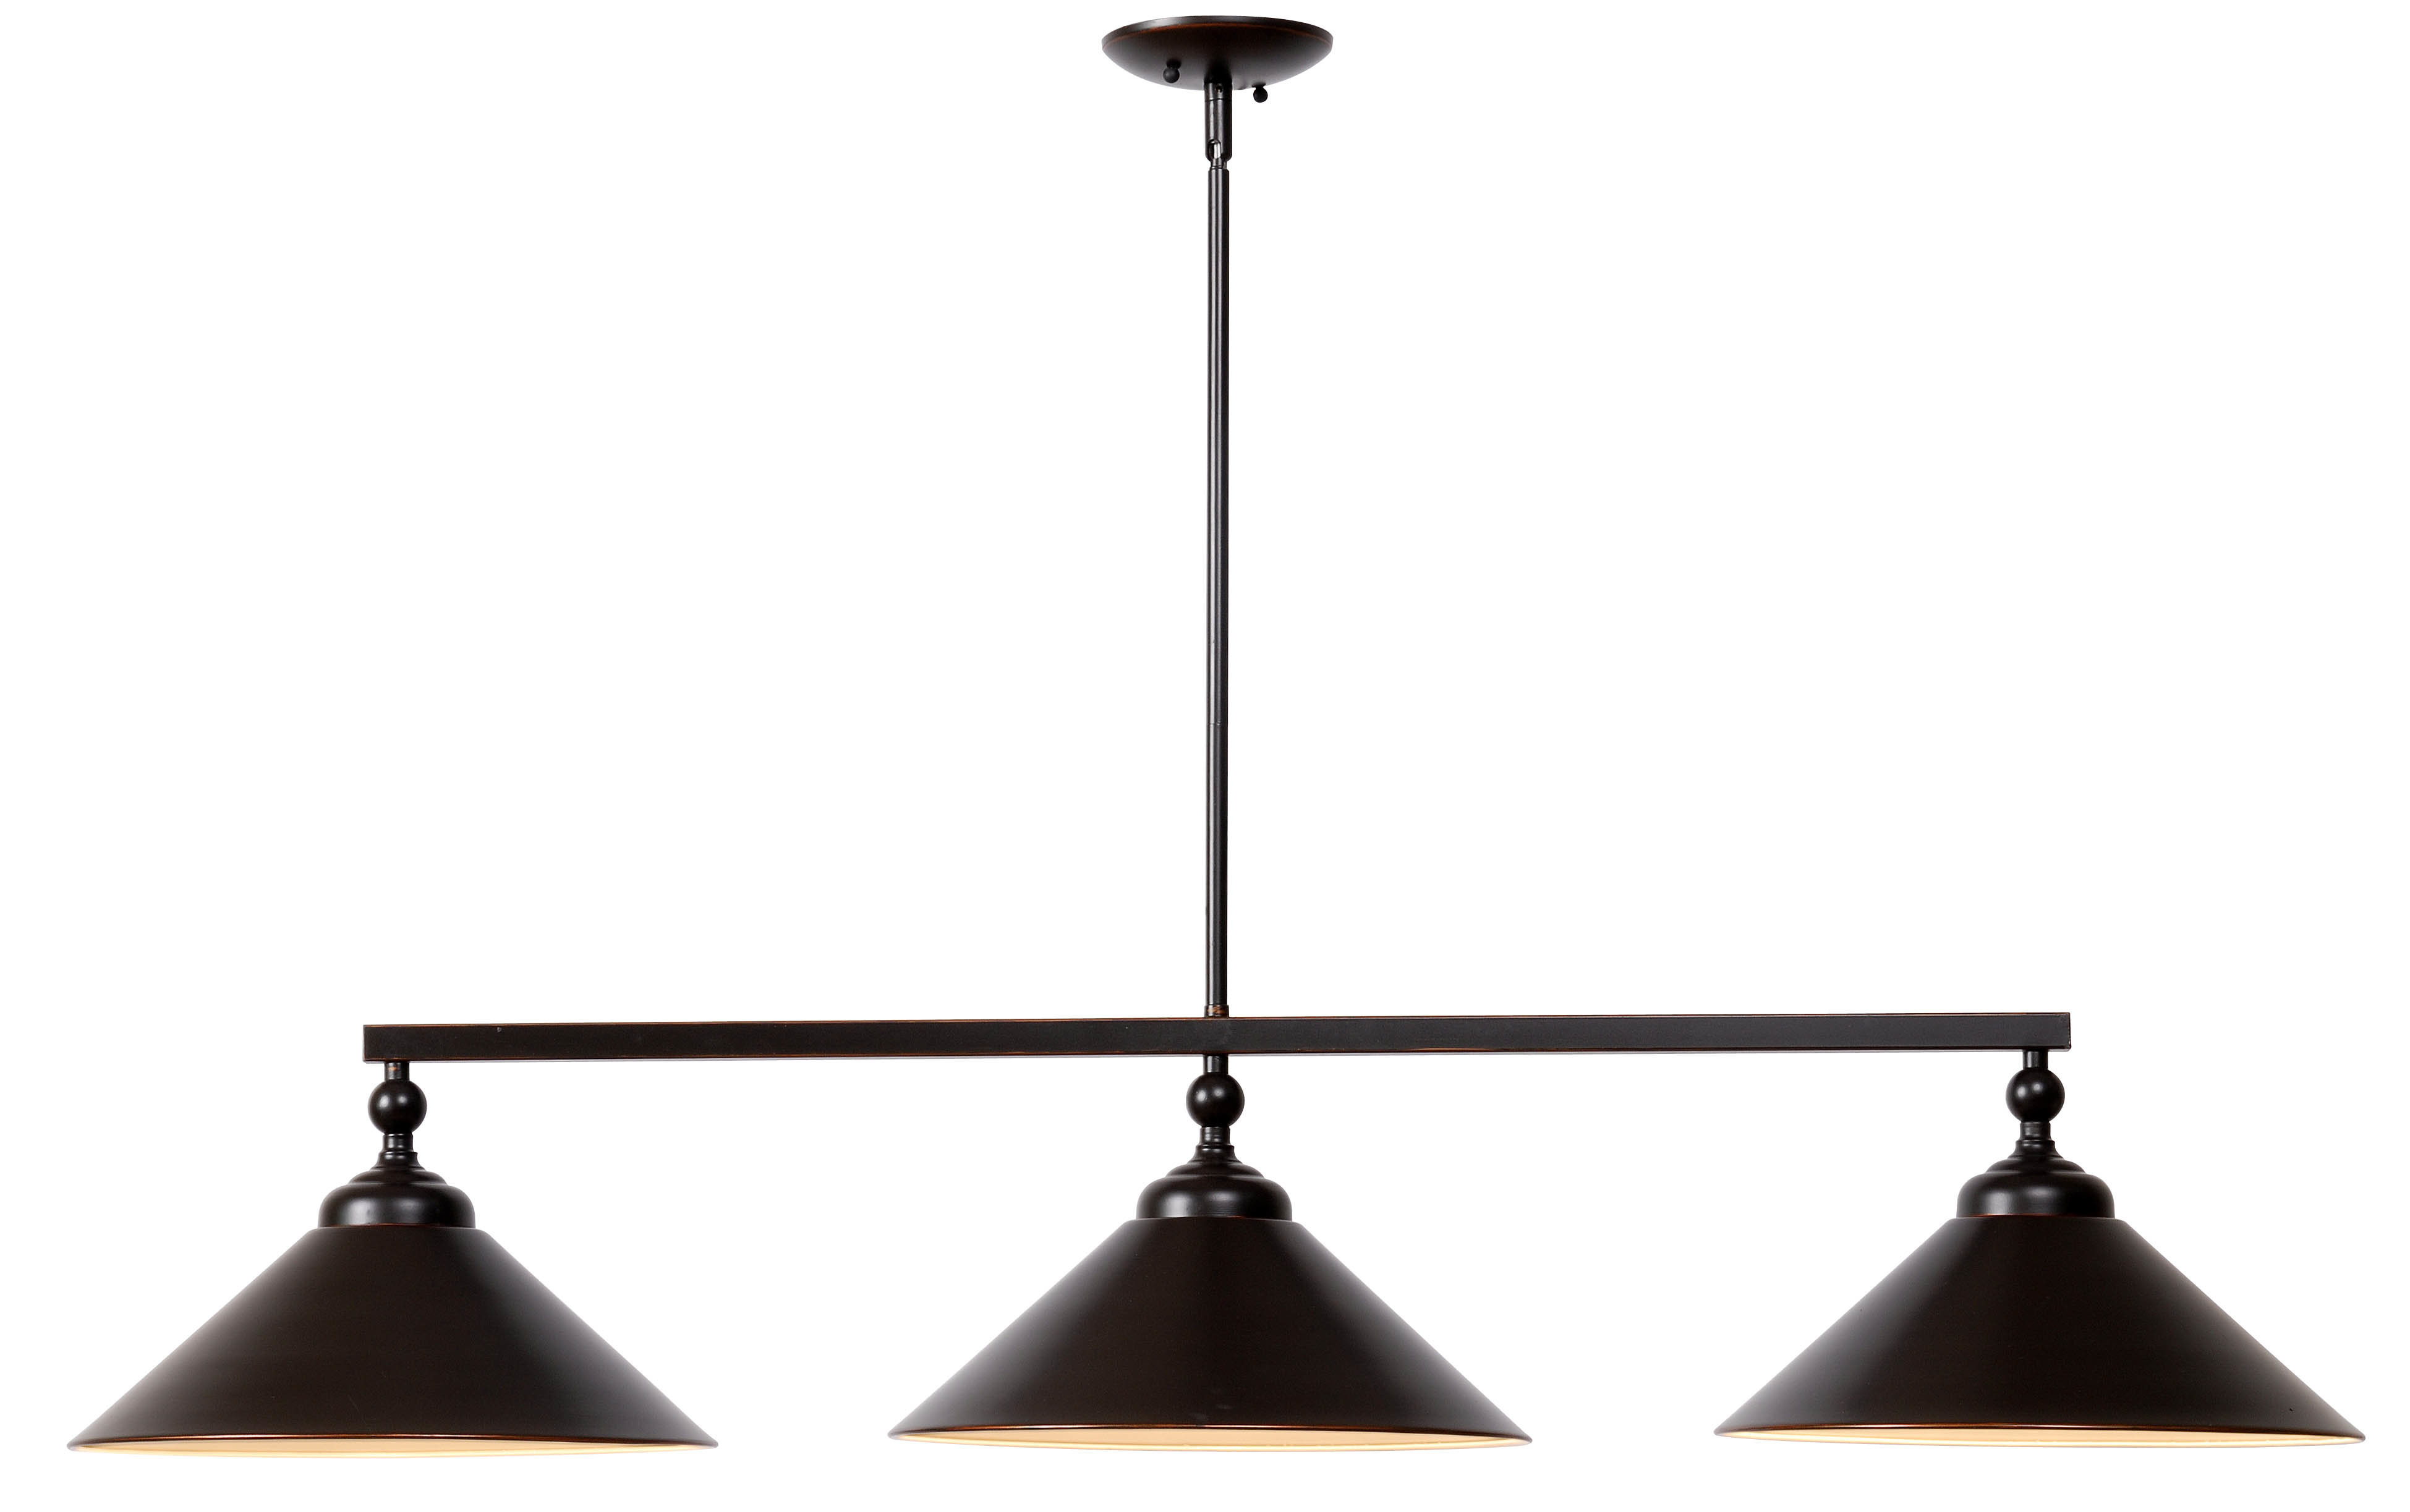 Debra 3 Light Kitchen Island Cone Pendant Regarding Cinchring 1 Light Cone Pendants (View 16 of 30)